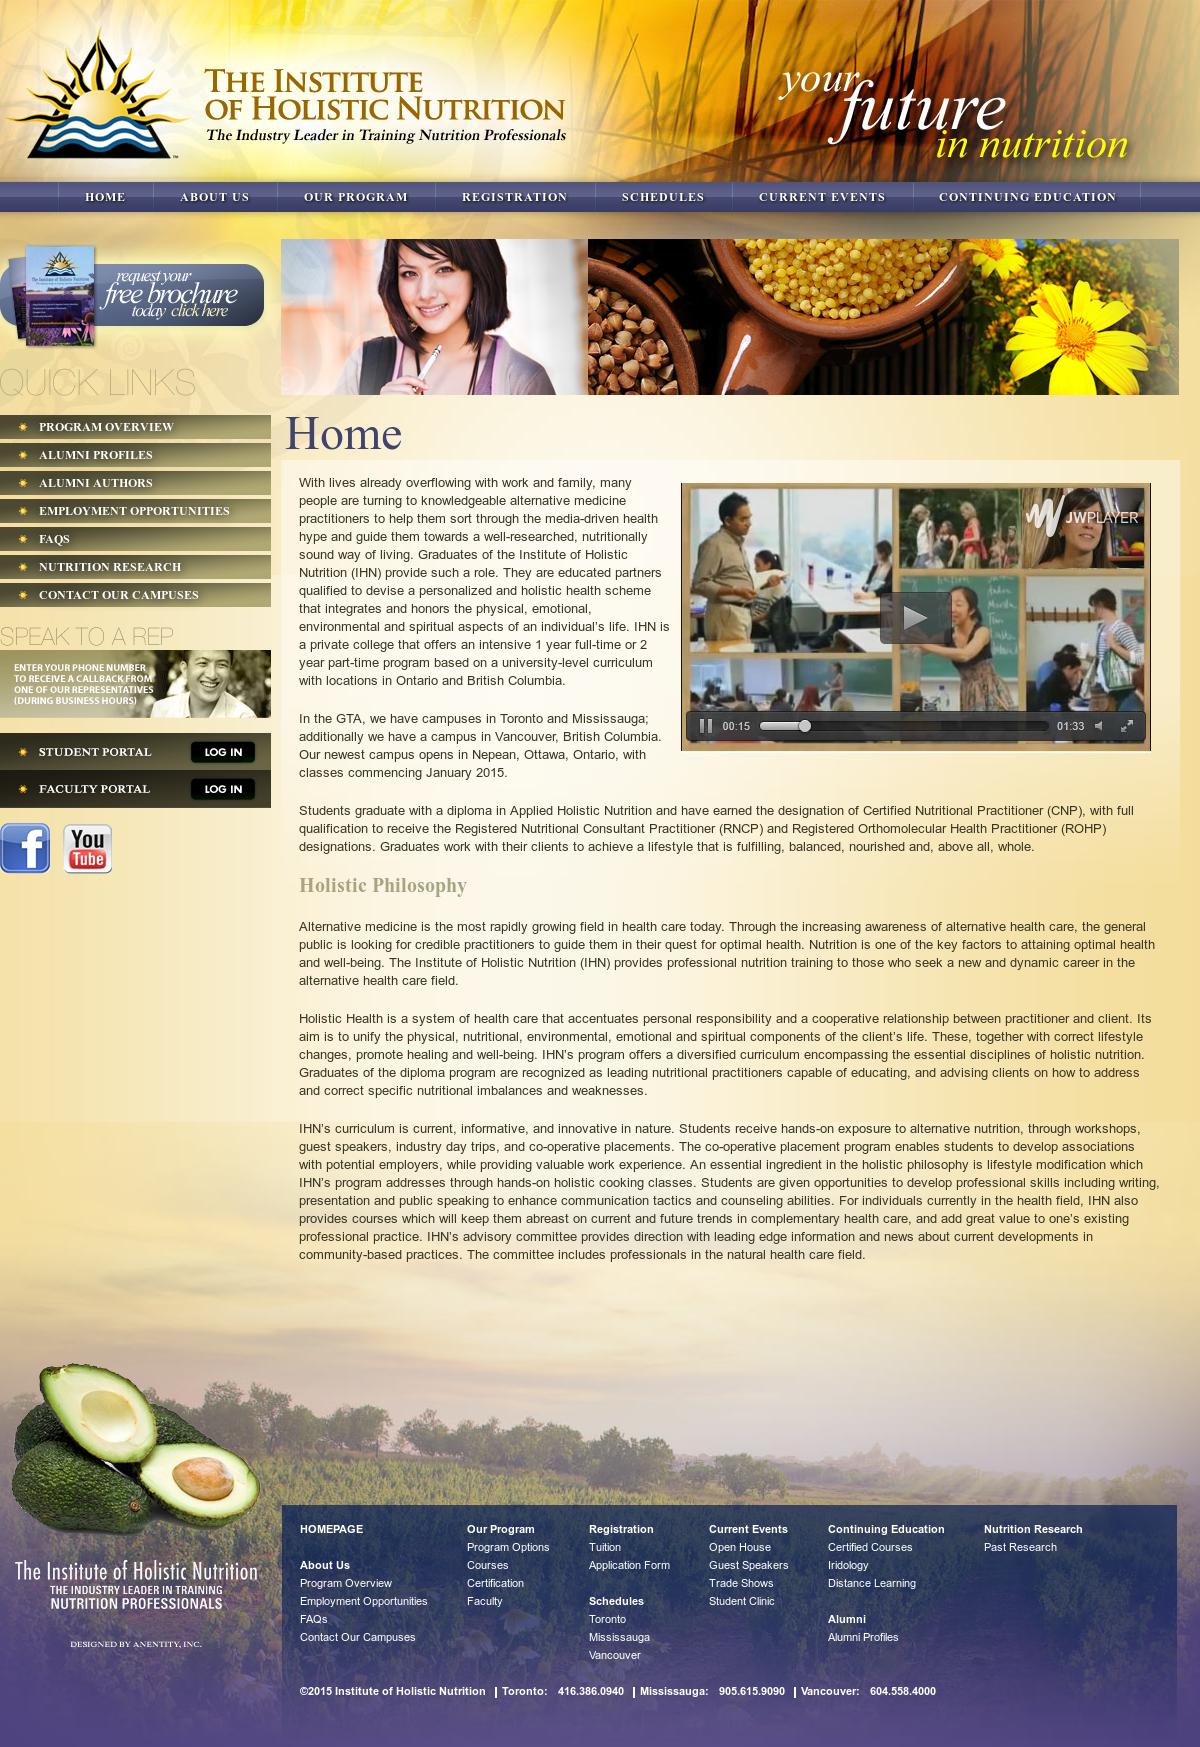 The Institute For Holistic Nutrition Competitors, Revenue